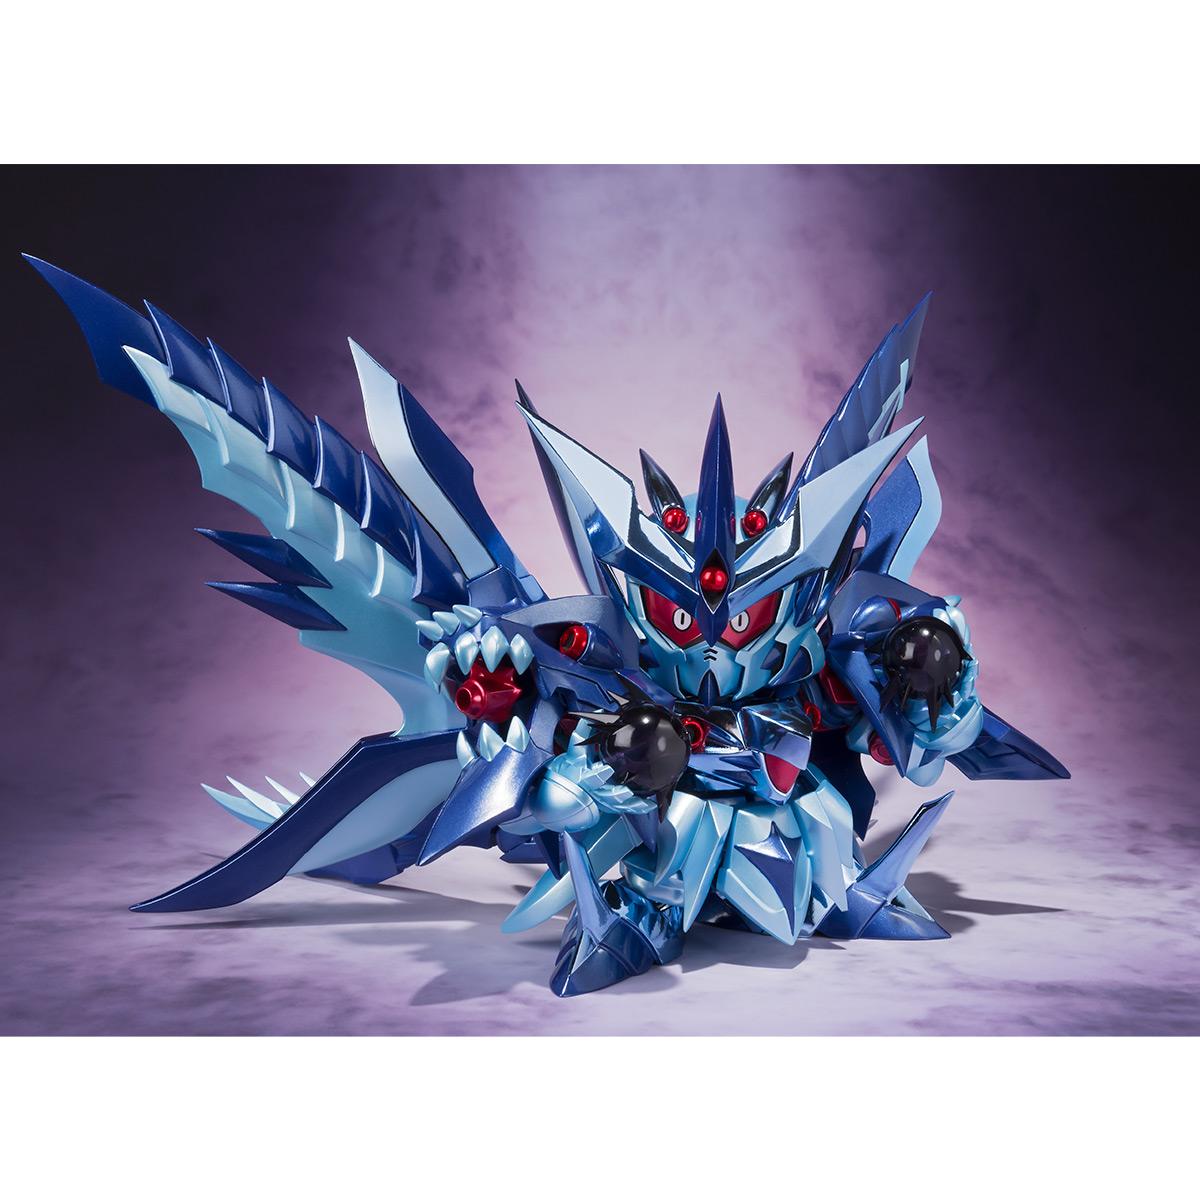 img_sdx_superior_dragon_dark_06_gec.jpg